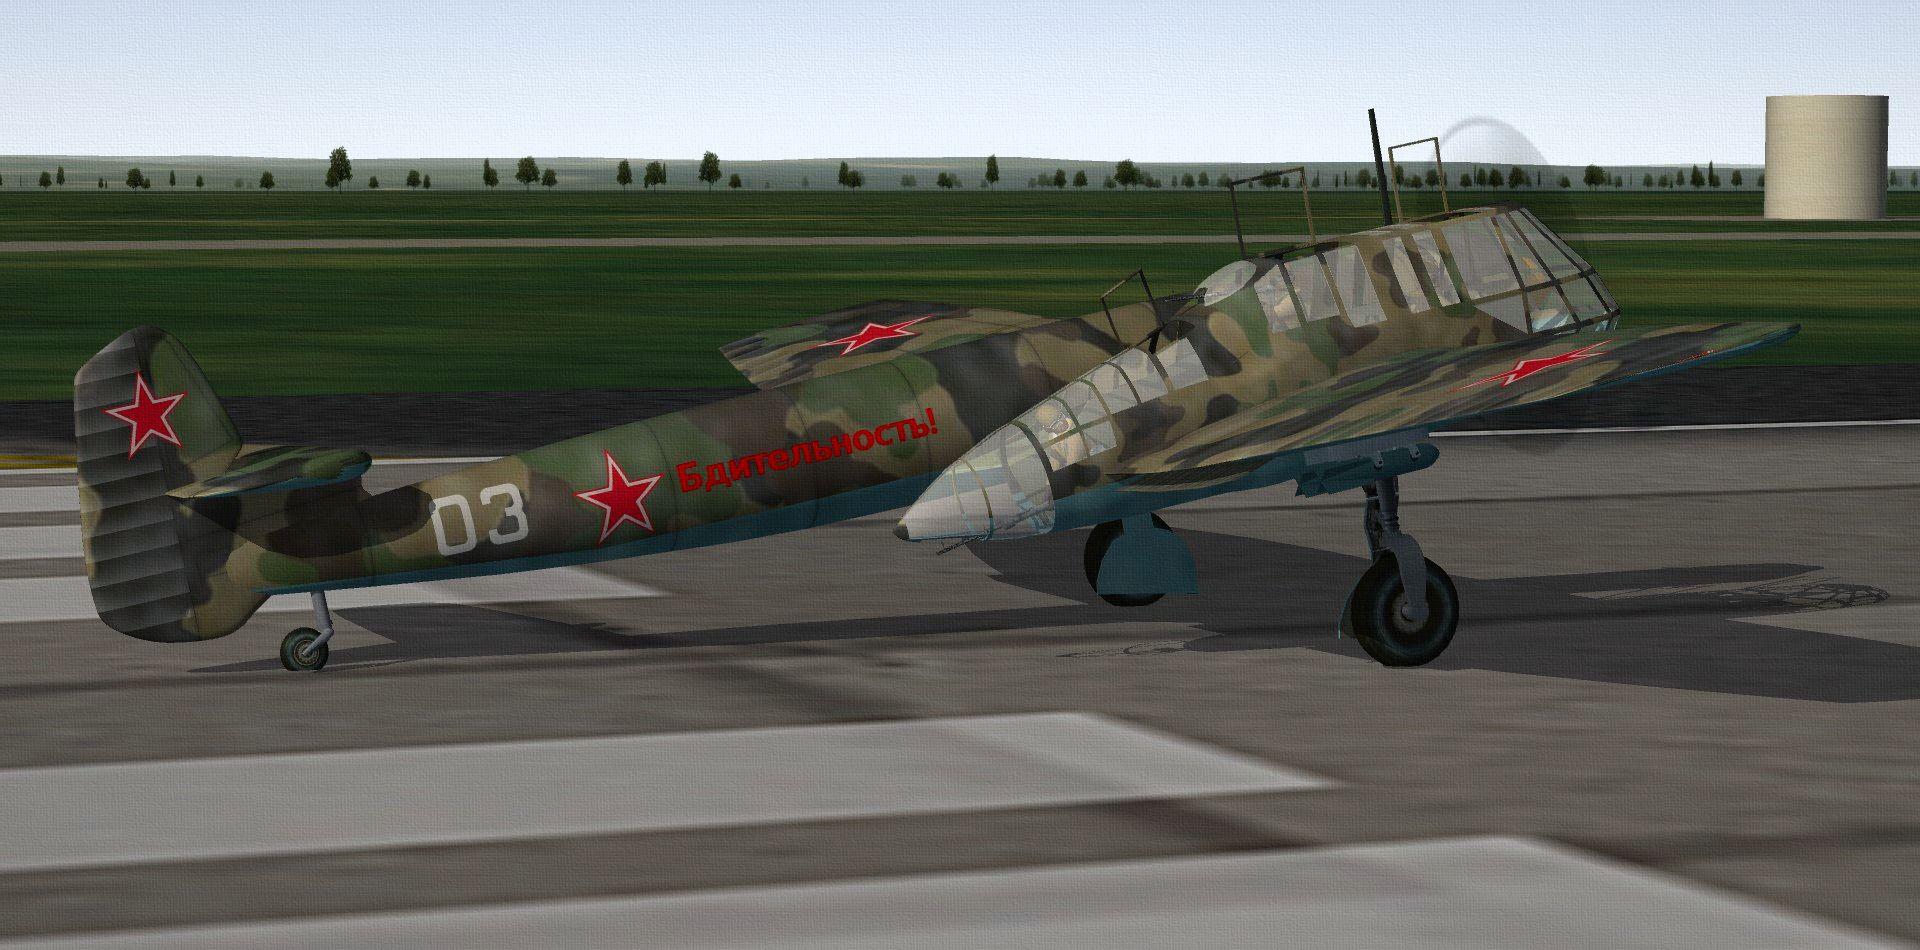 SOVIET%20BV-141.01_zpsewdpjkko.jpg